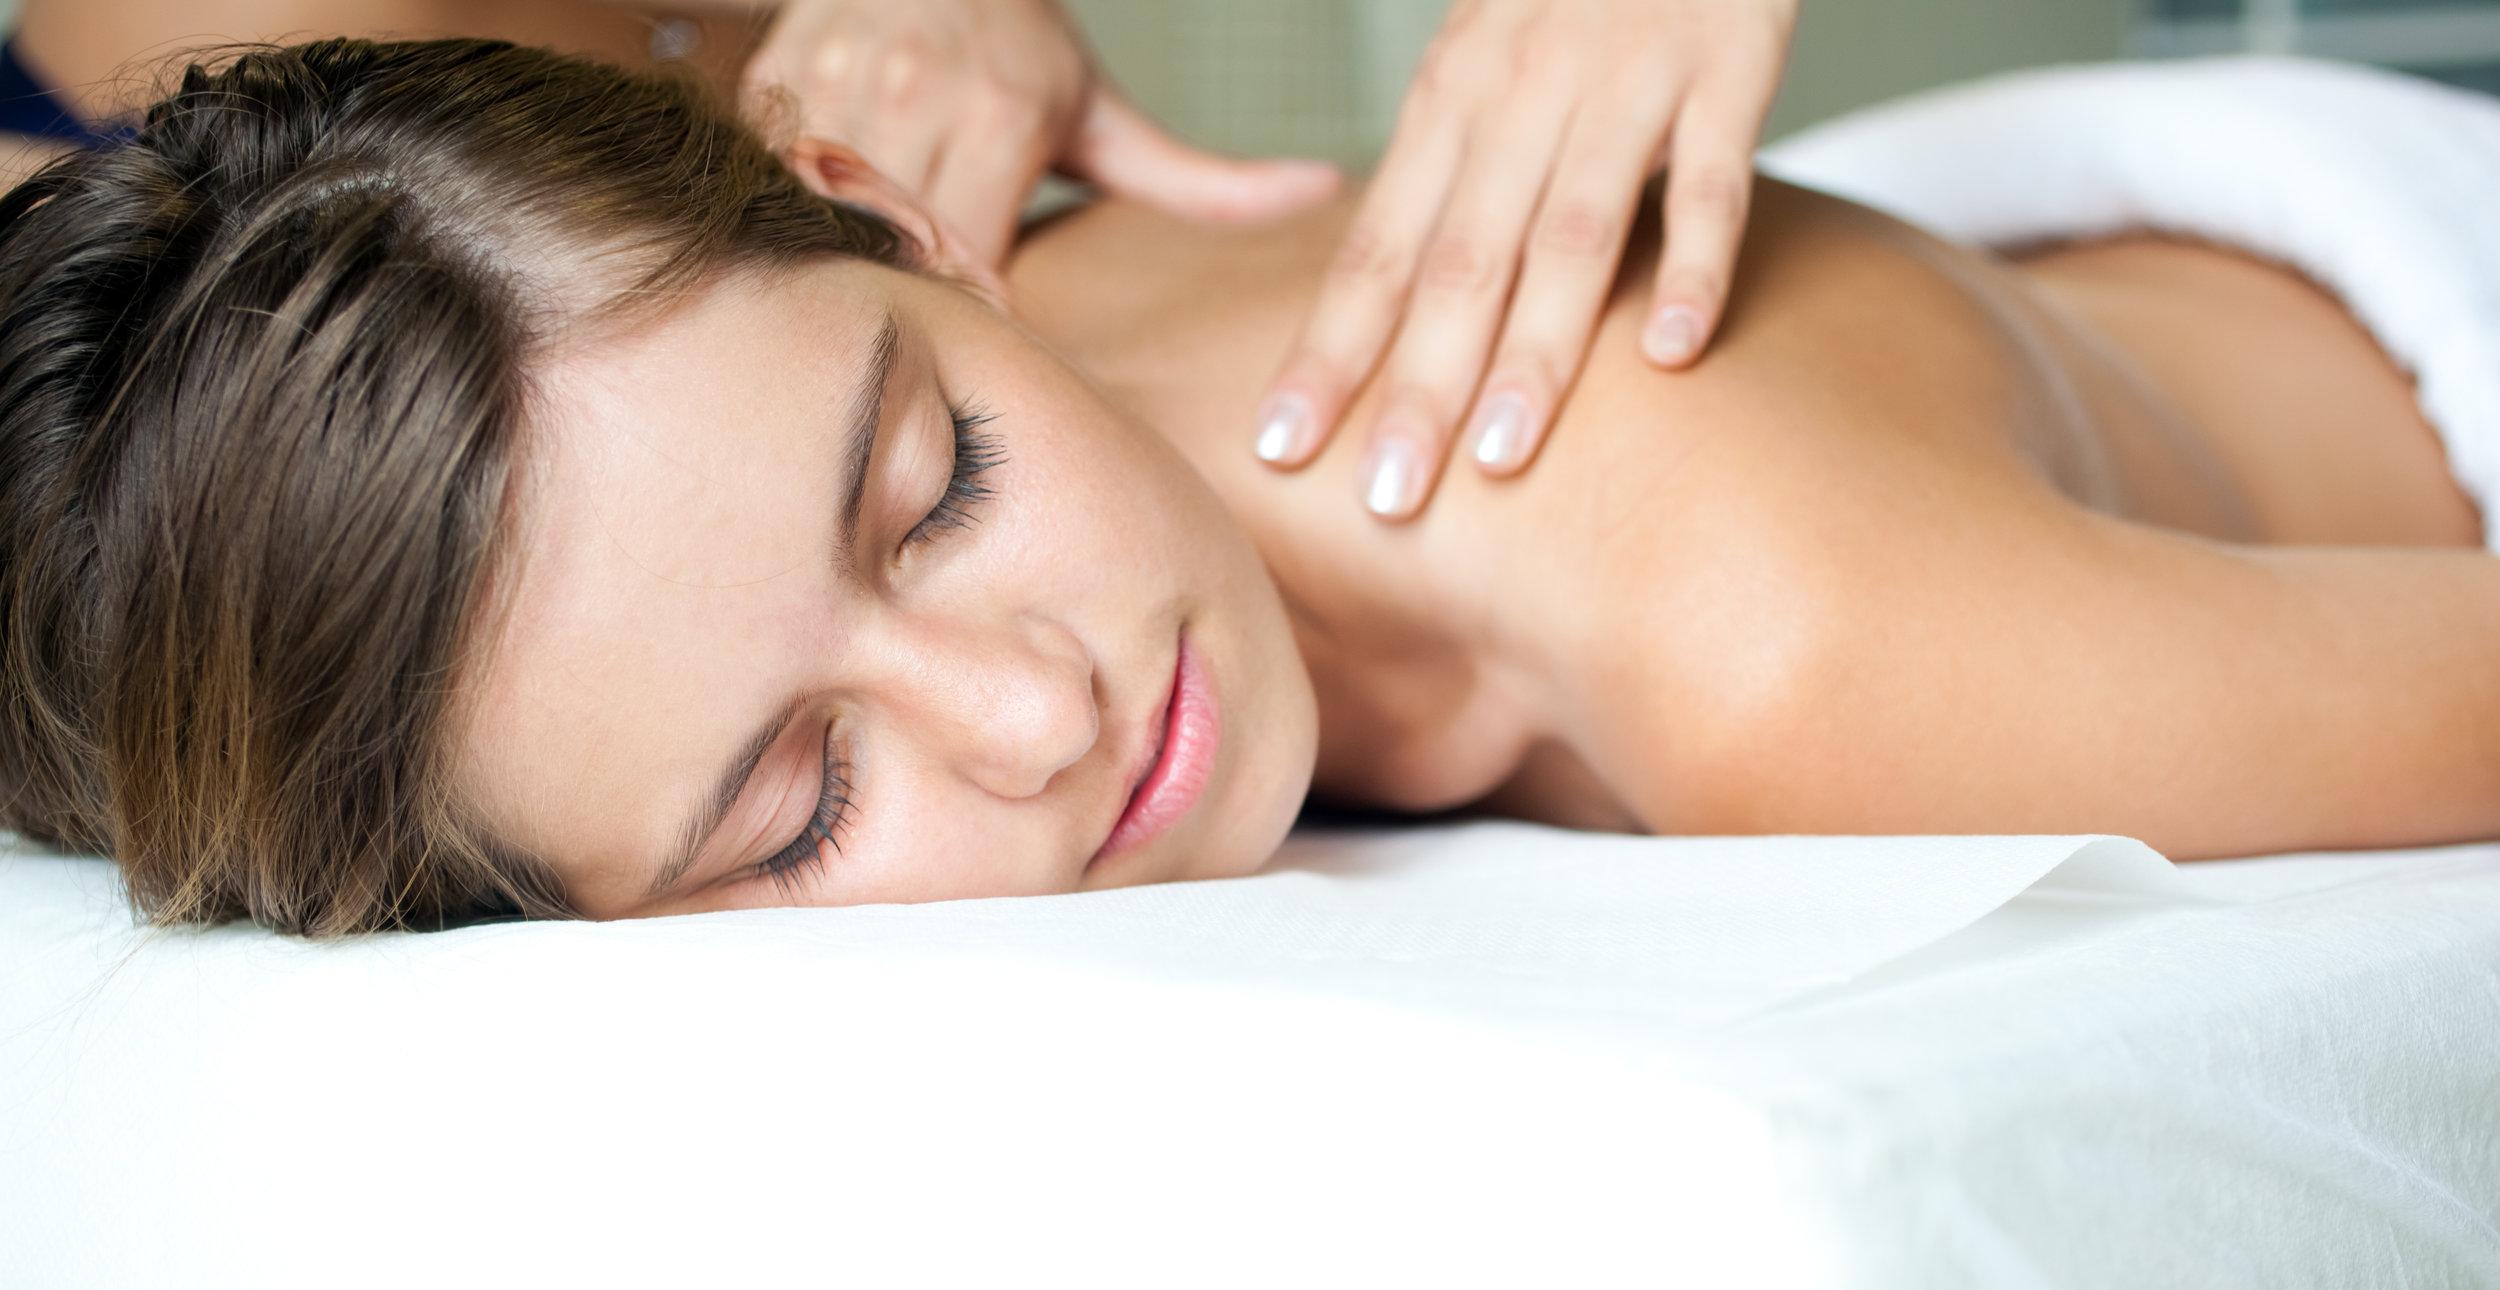 Feel_Good_Therapy_Massage.jpg